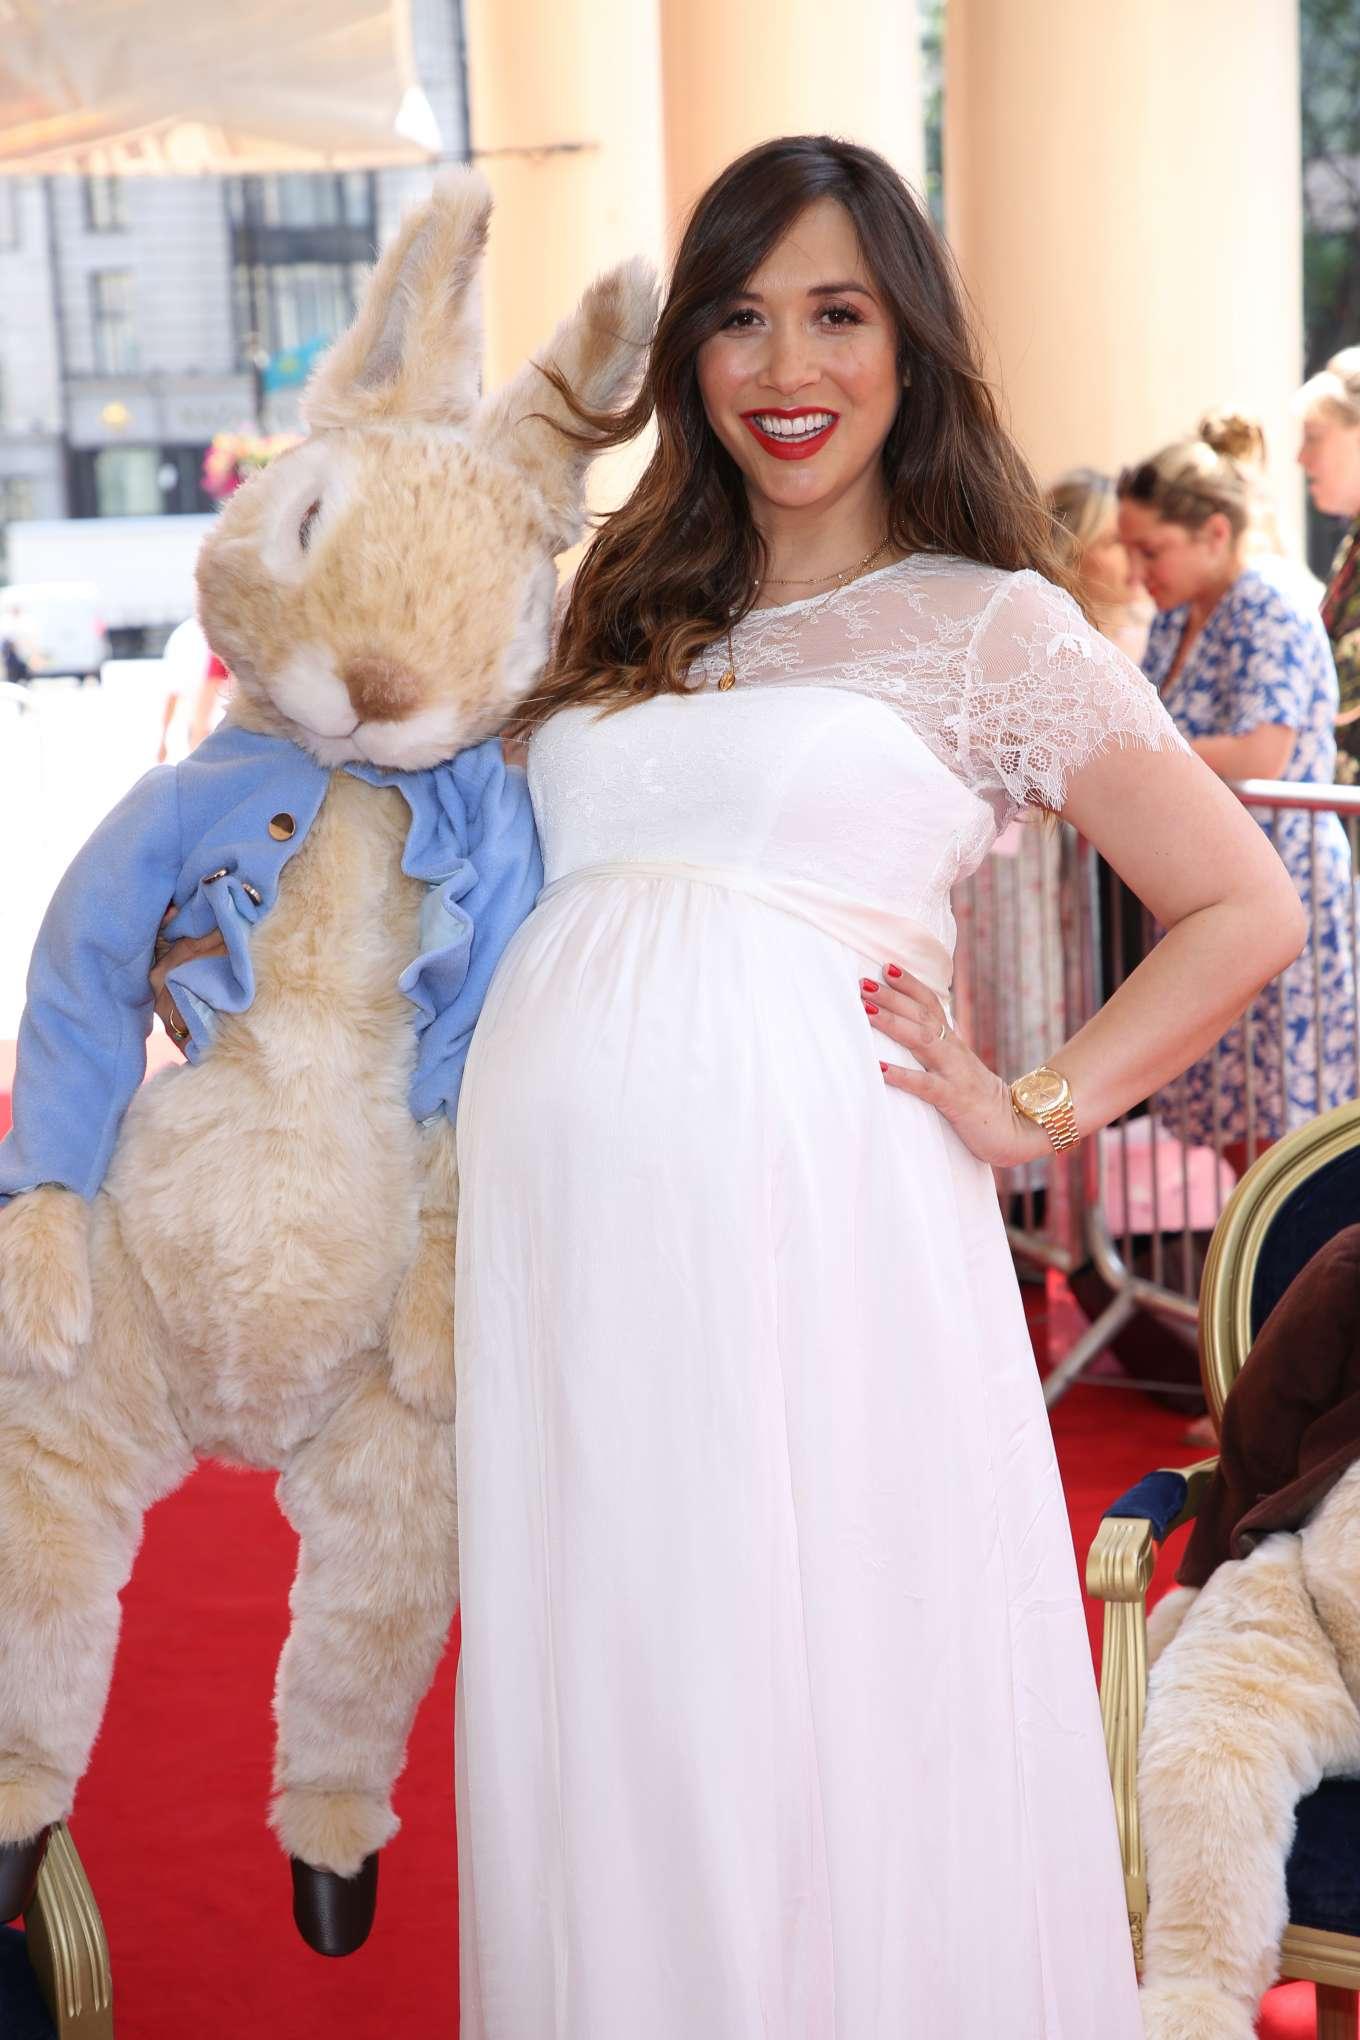 Myleene Klass - 'Where is Peter Rabbit' Press Day in London